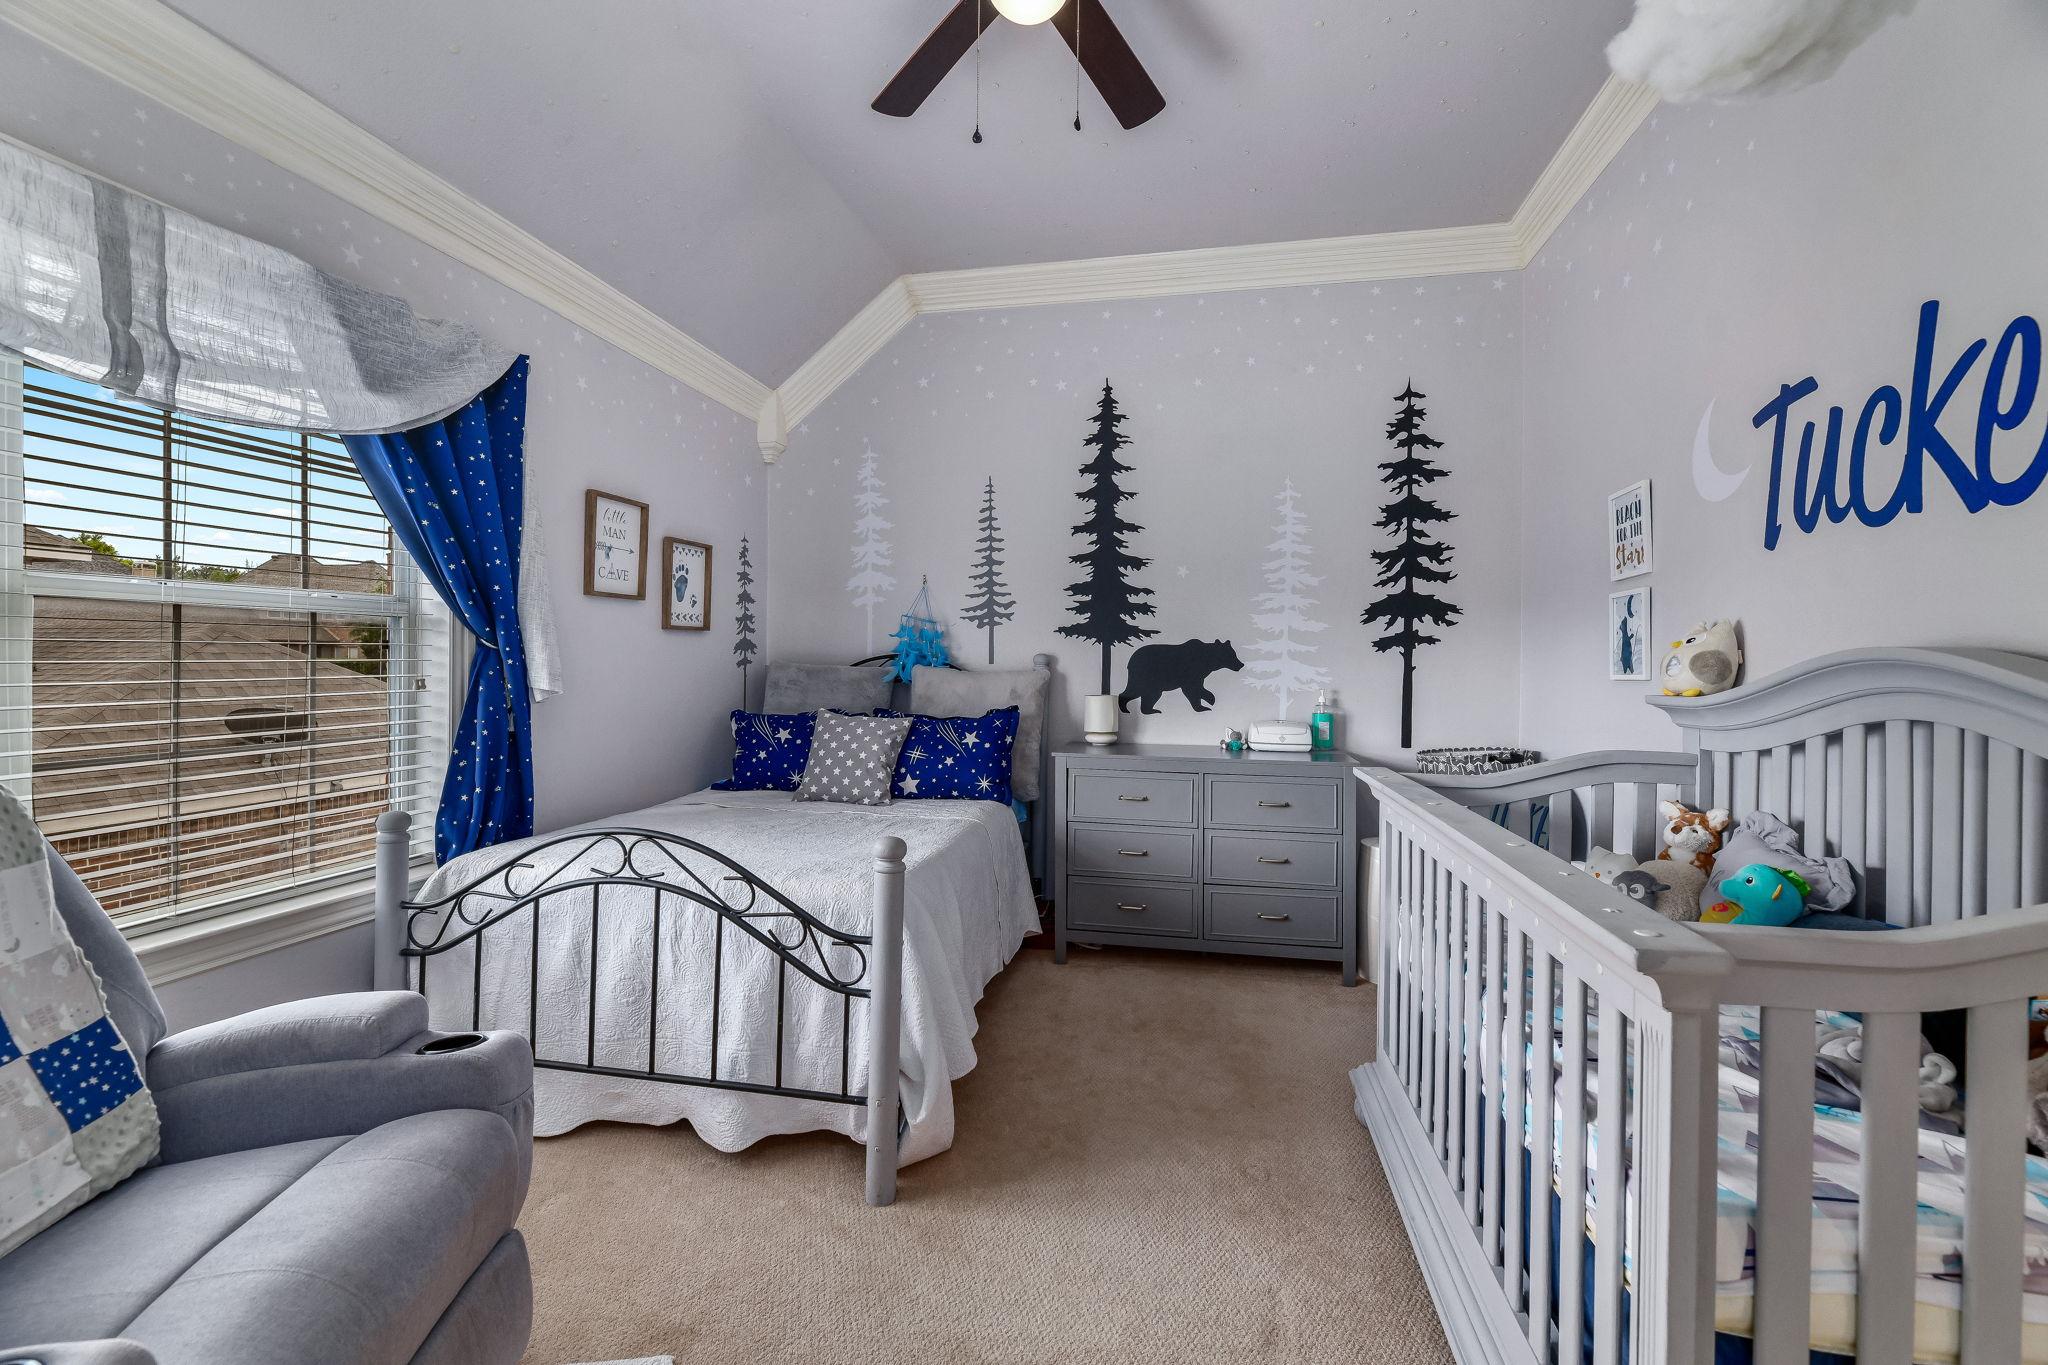 037-Bedroom 2-FULL